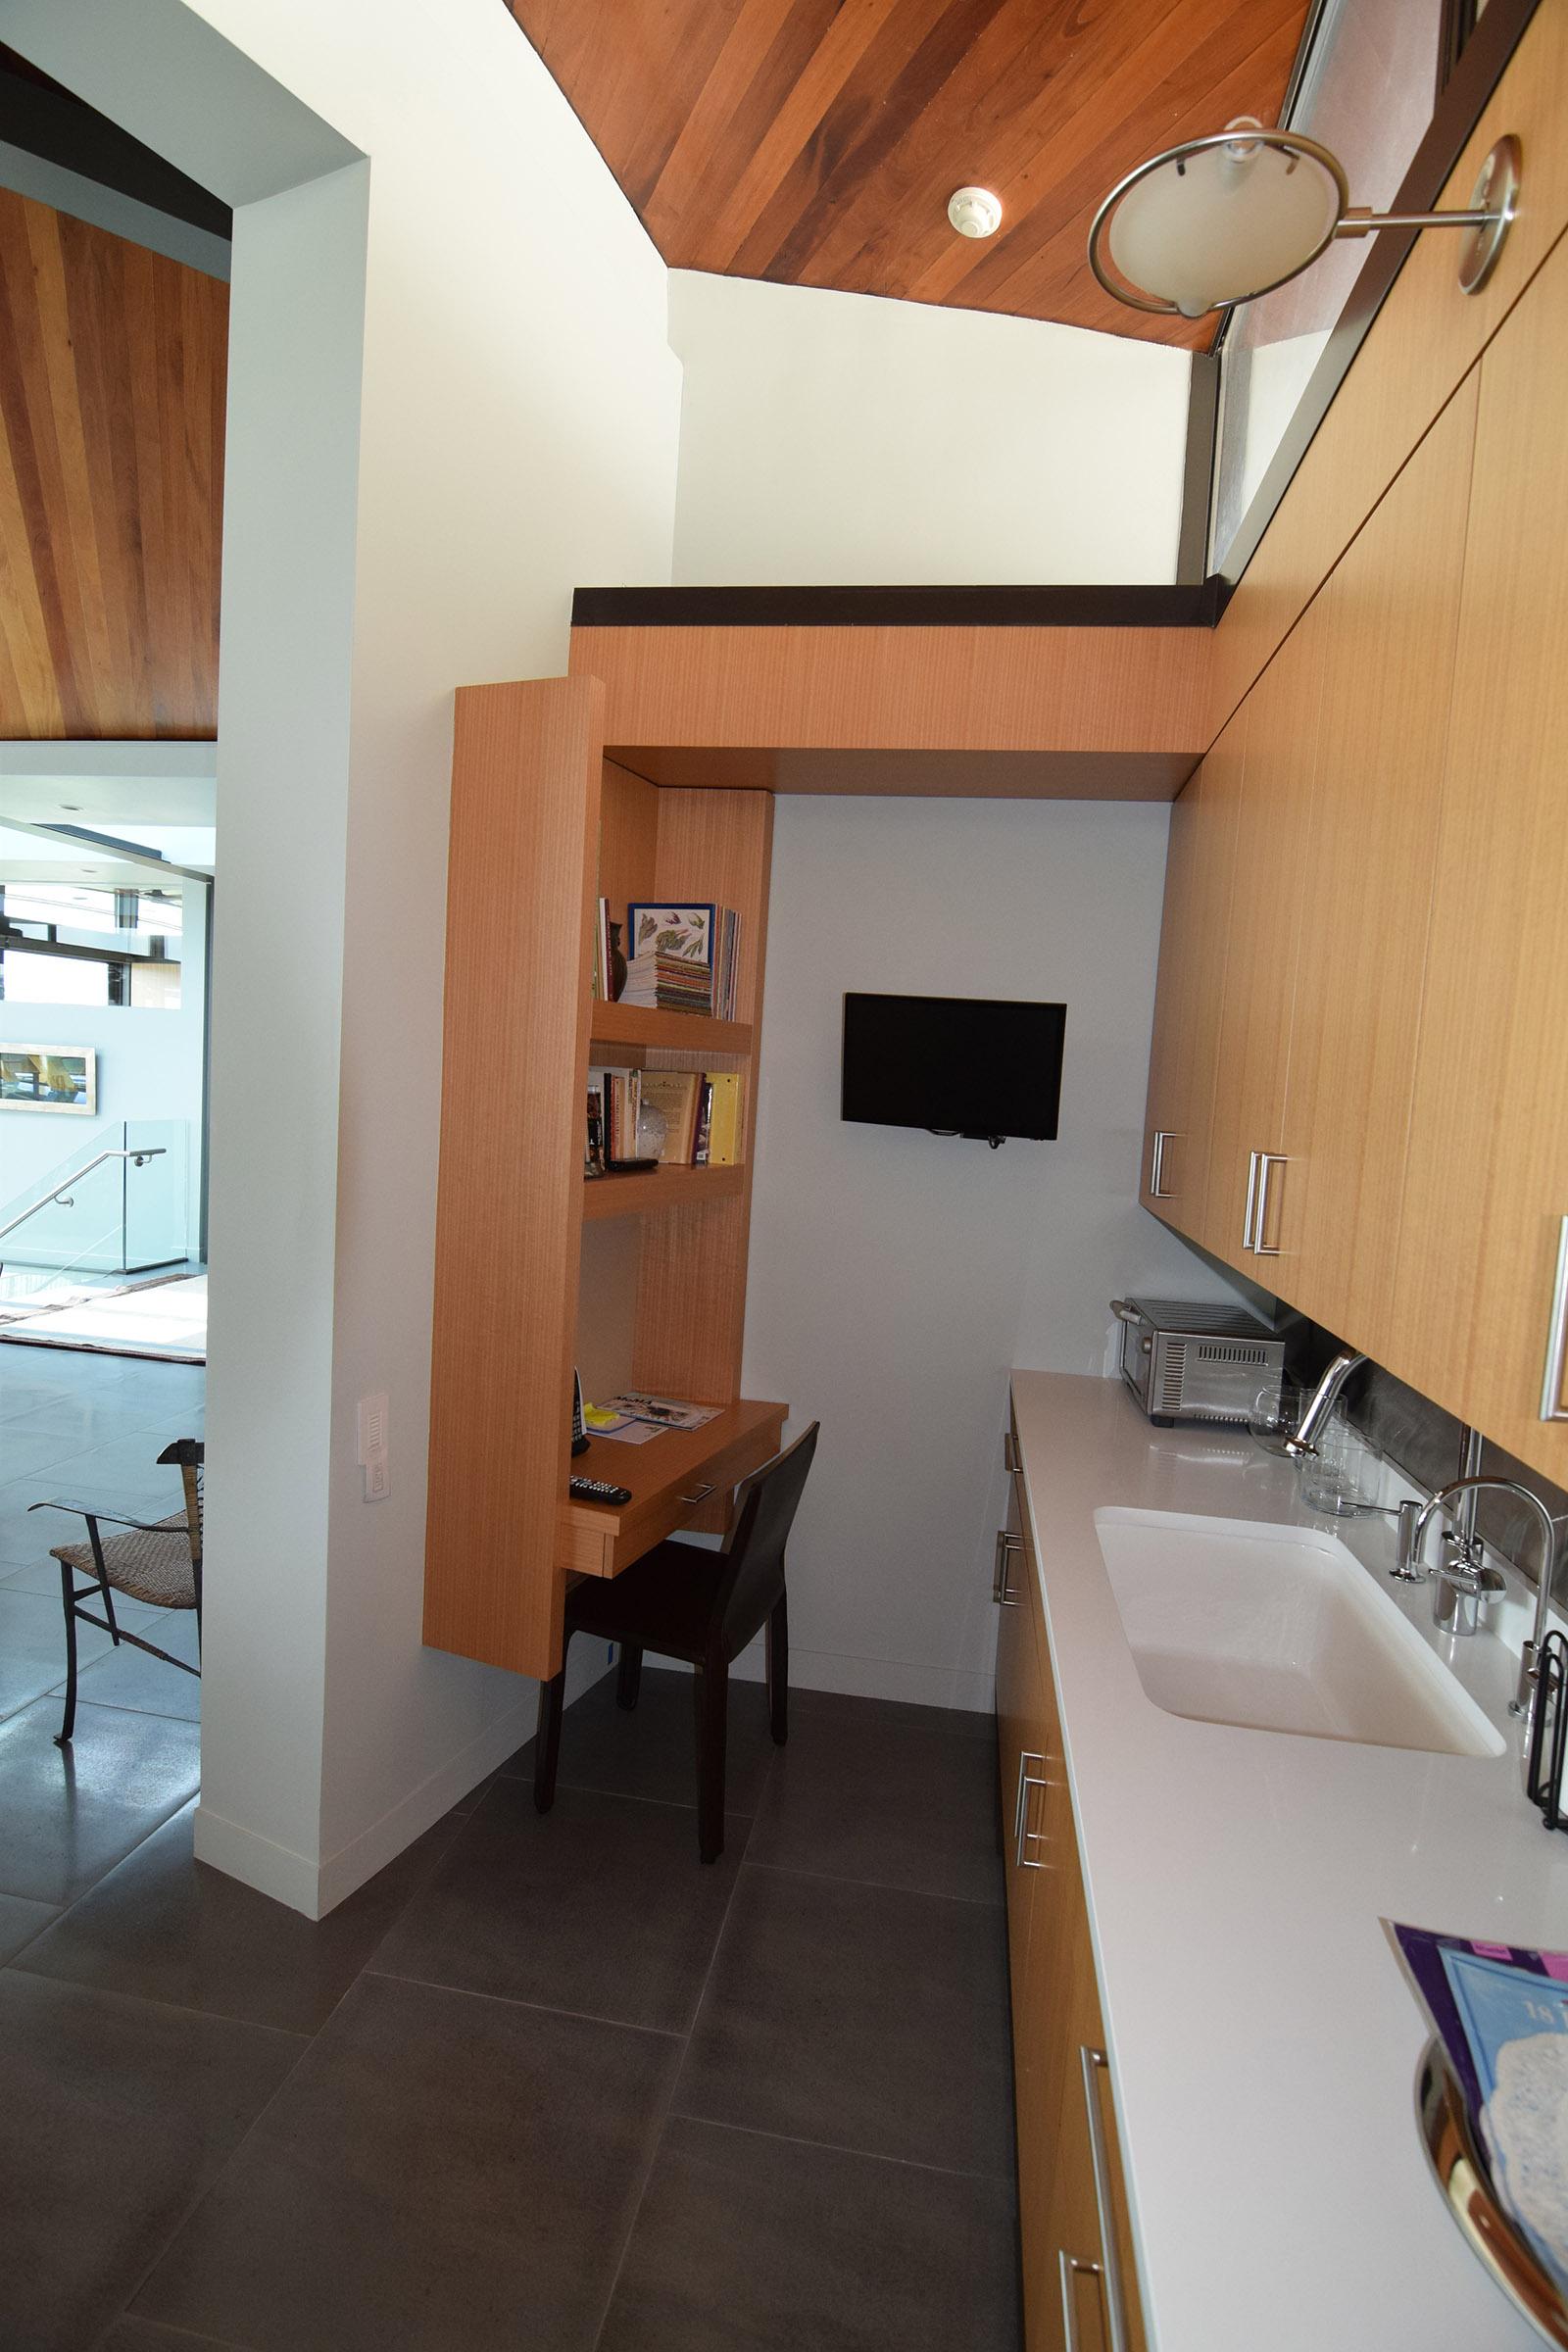 Custom Office Nook in the Kitchen, Rift Anigre